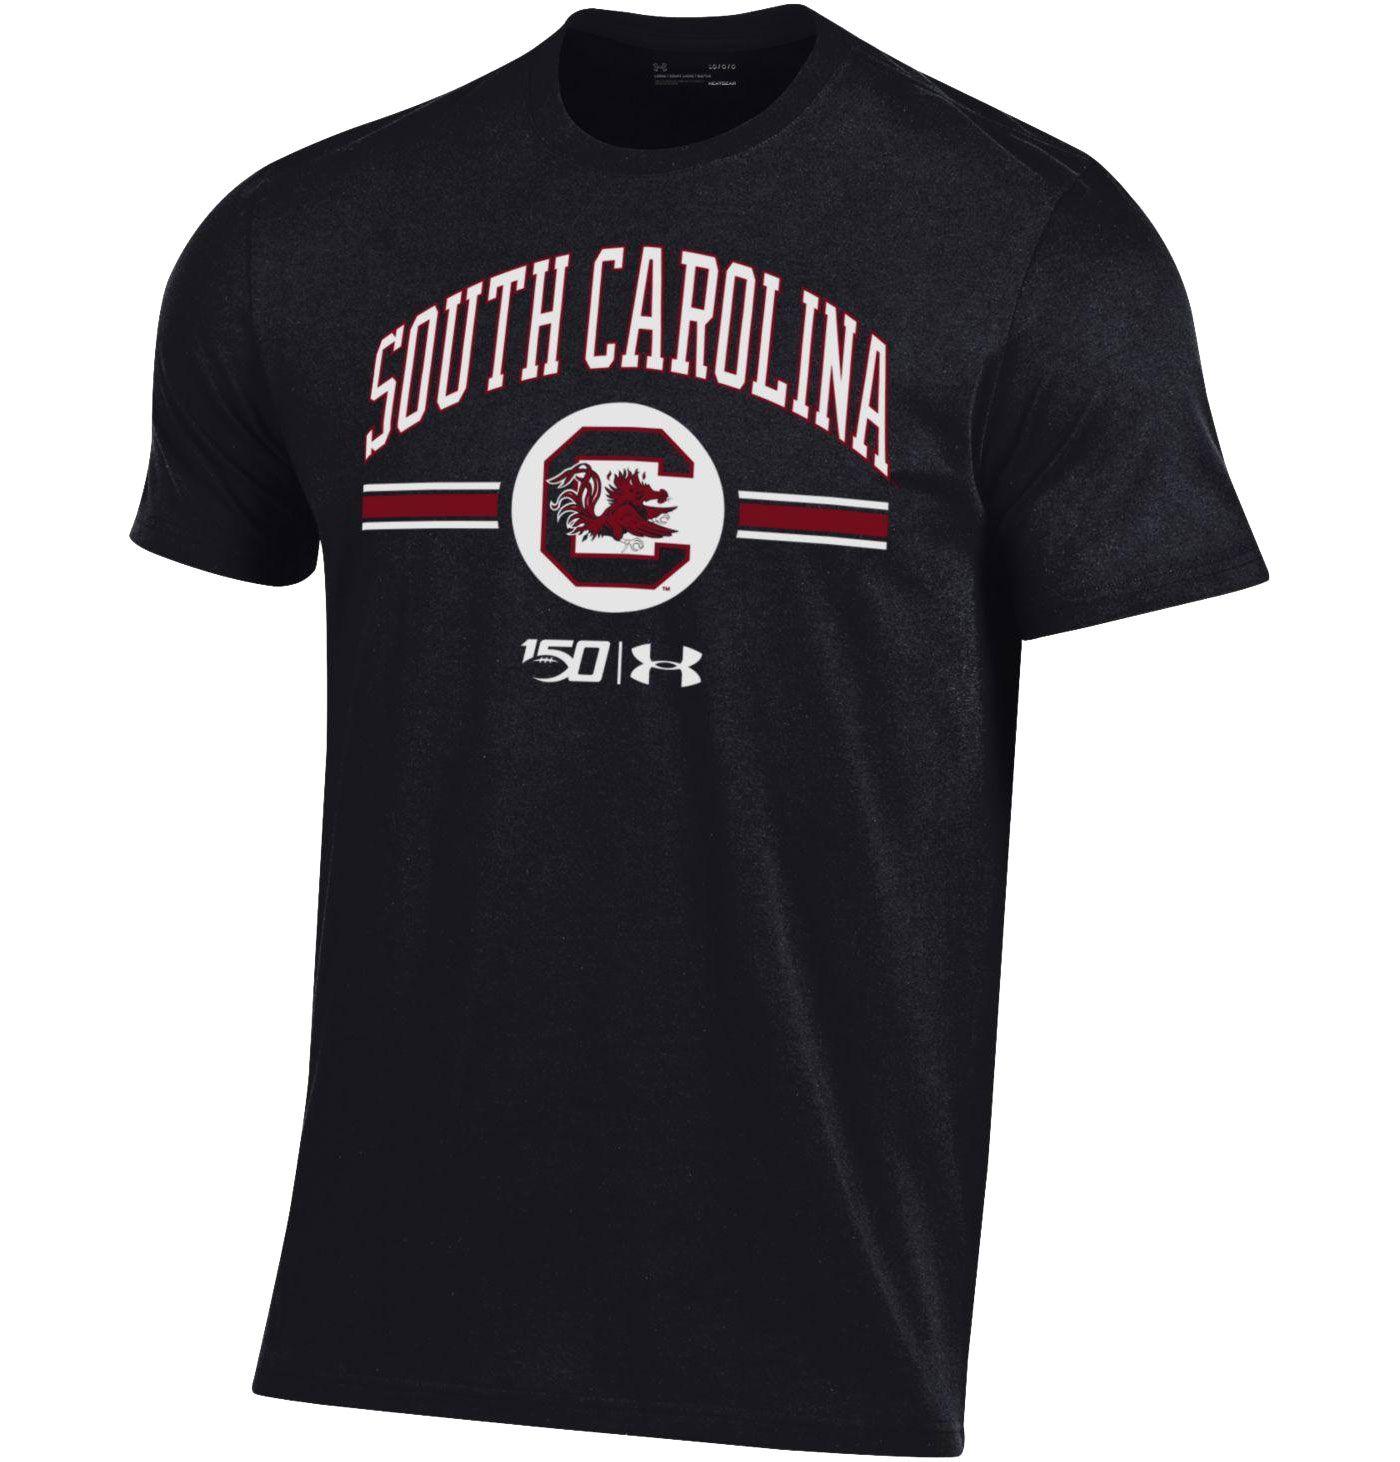 Under Armour Men's South Carolina Gamecocks 'CFB150' Performance Cotton Football Black T-Shirt